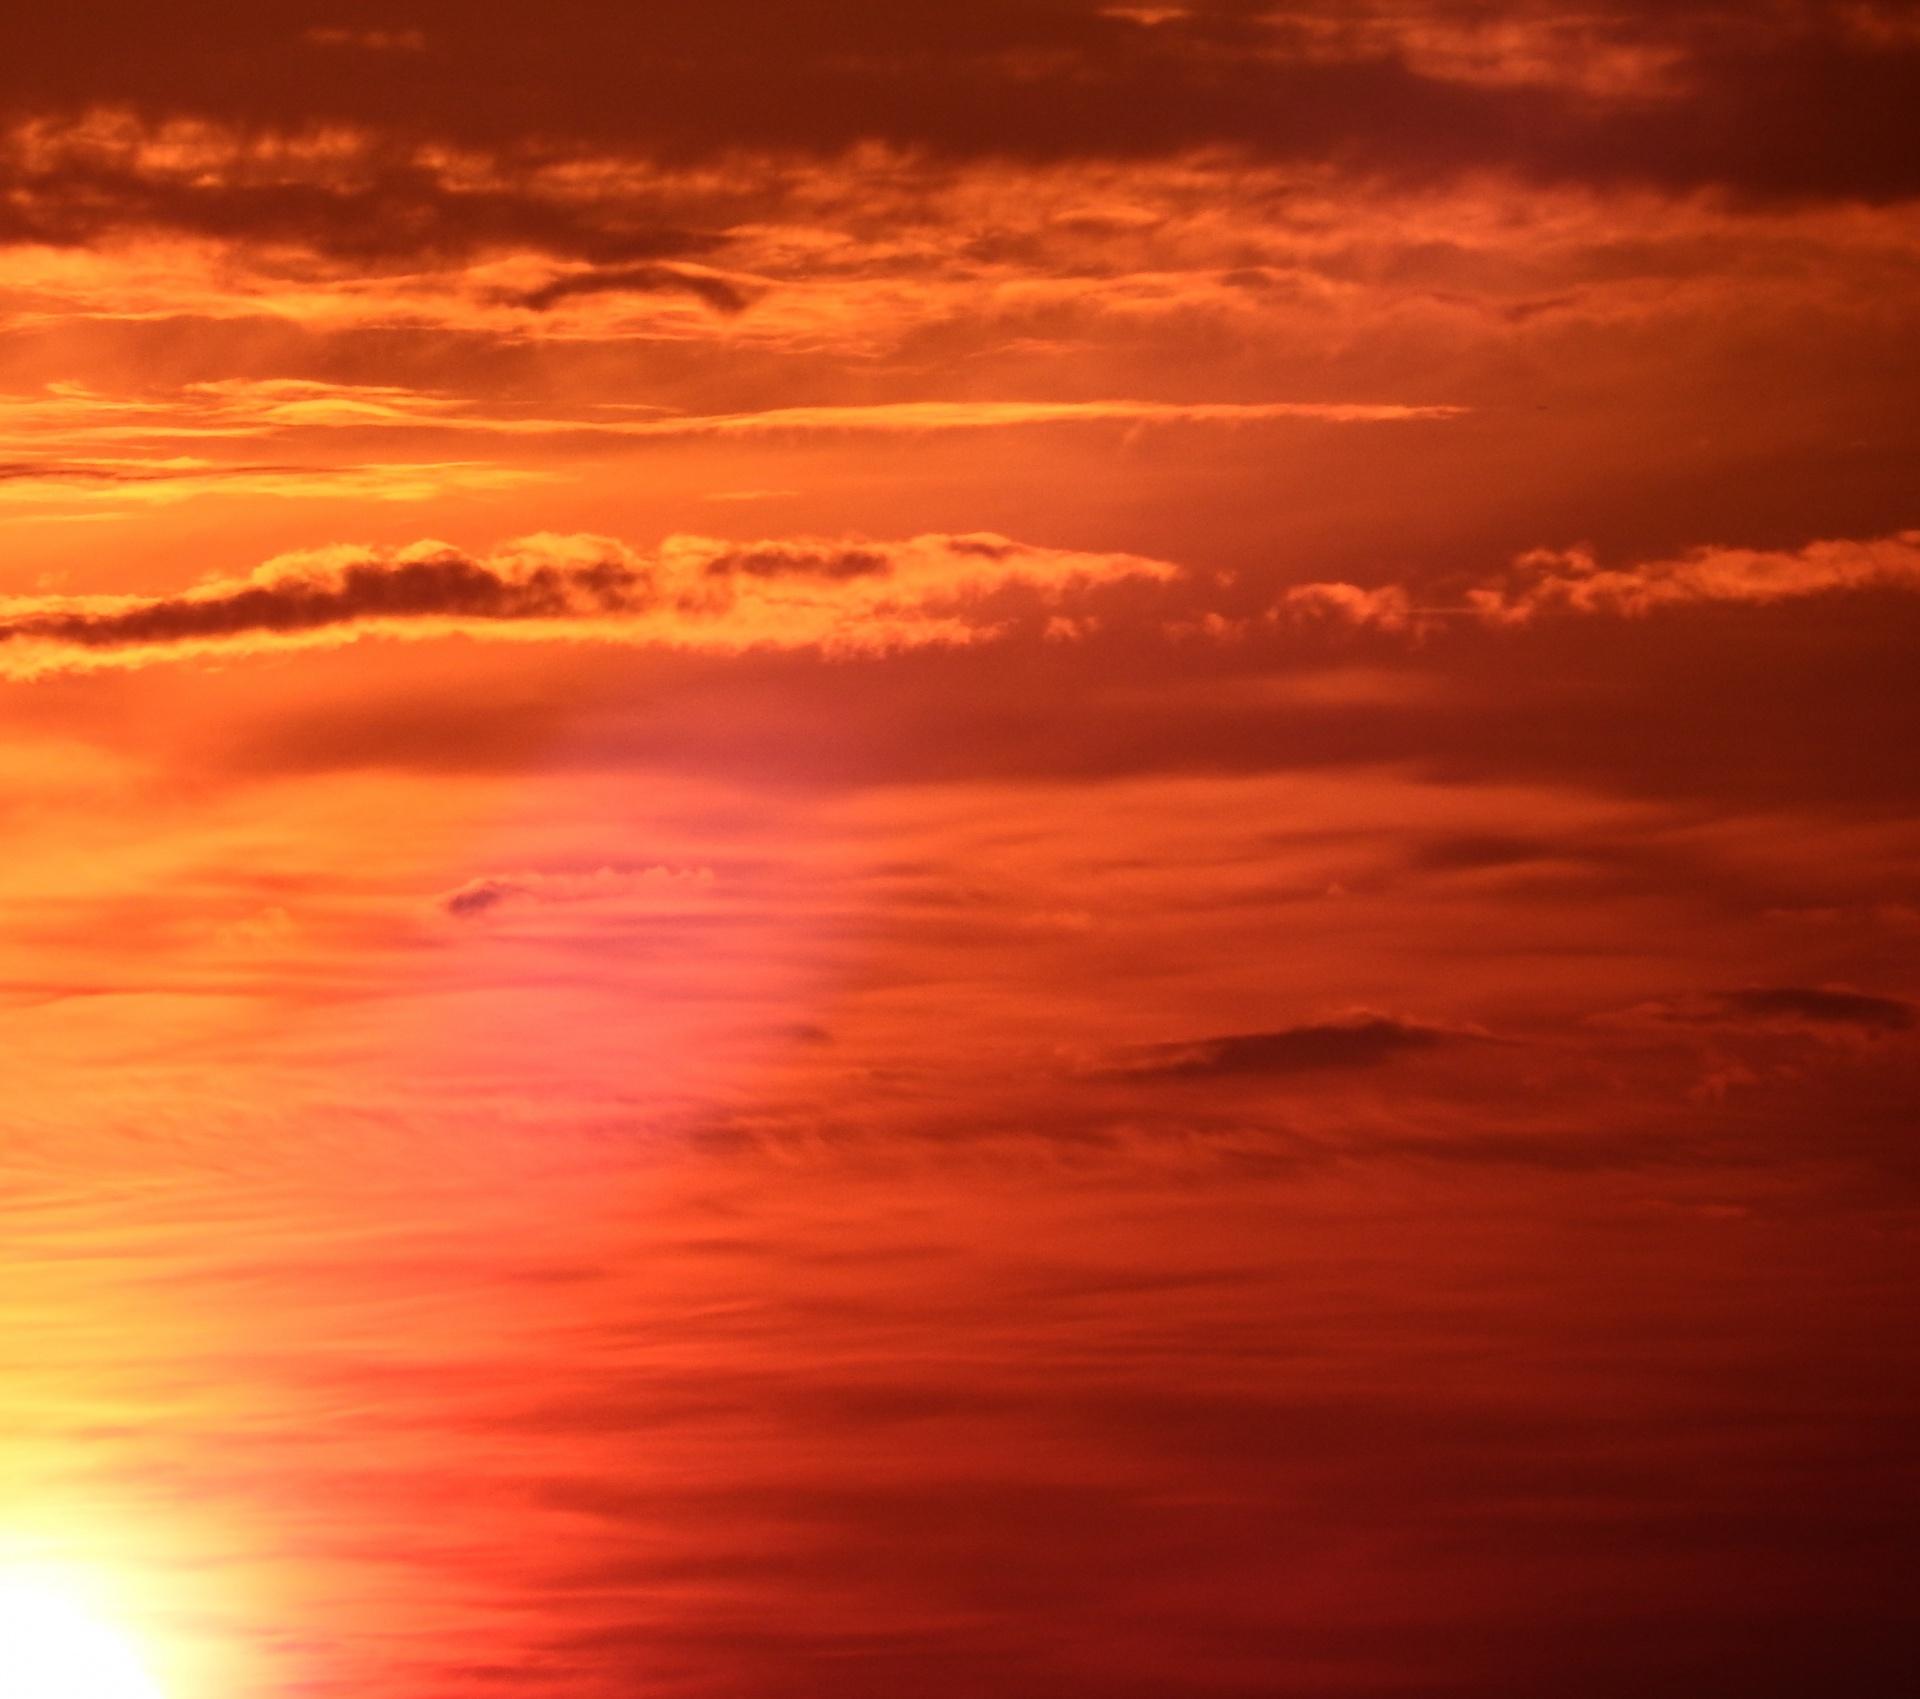 Bright Orange Sunset Sky Free Stock Photo Public Domain